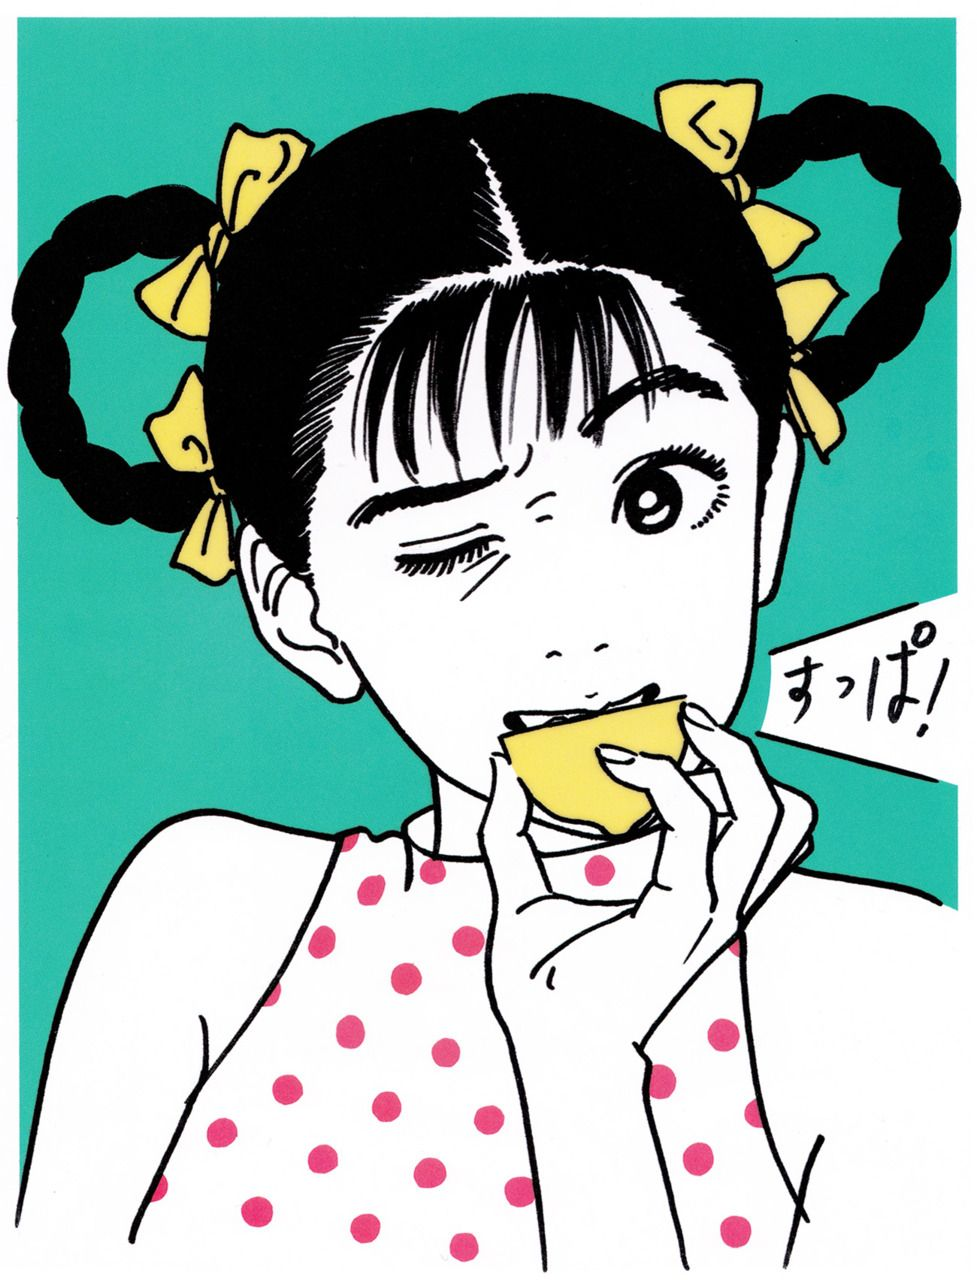 Eguchi Hisashi You Can Do It 2 Www Zazzle Com Posters Rf